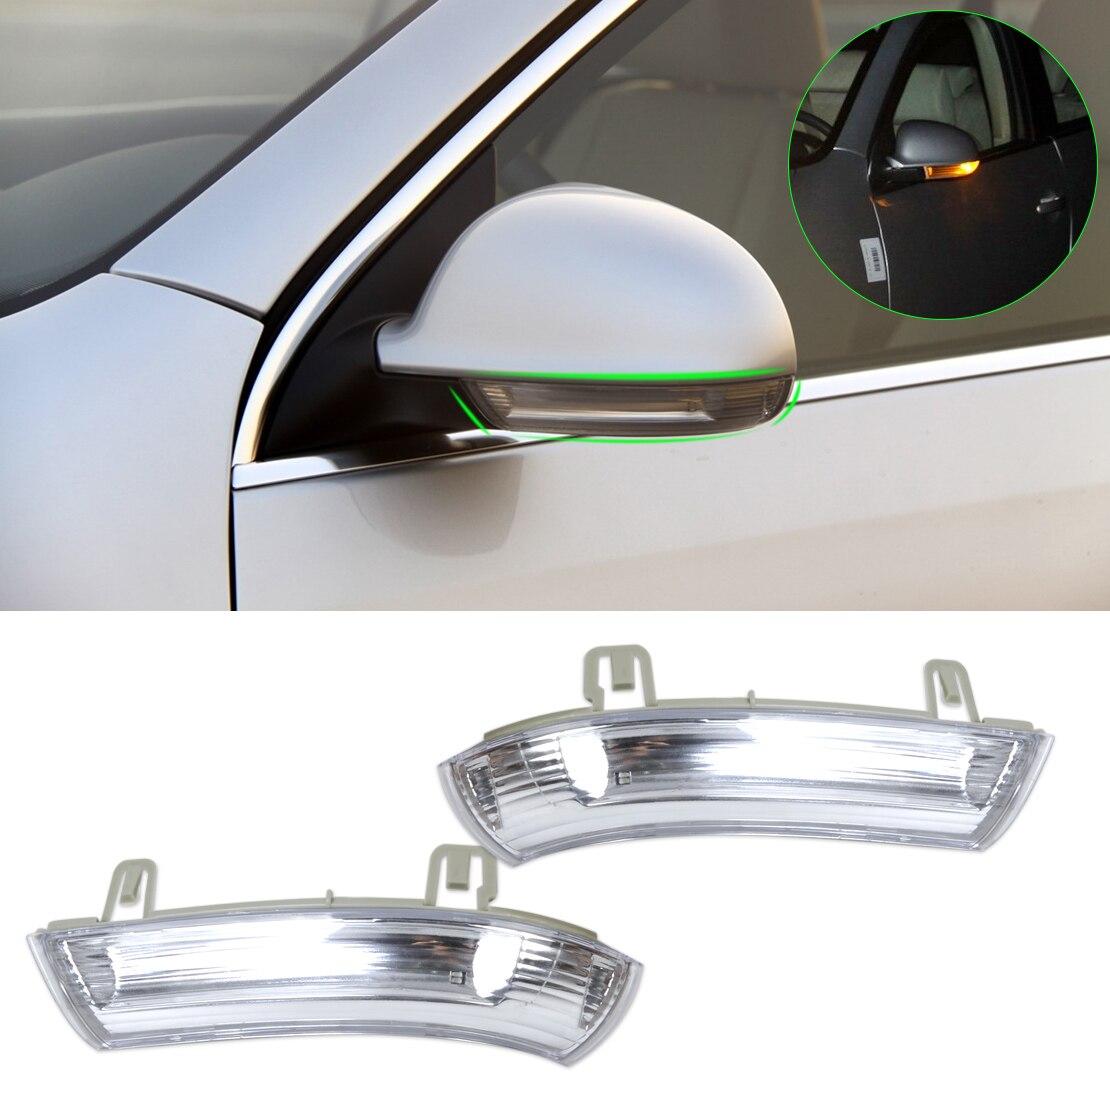 beler 2x Mirror Indicator Turn Signal Light 1K0 949 101,1K0 949 102 for VW GOLF GTI JETTA MK5 PASSAT RABBIT Skoda SUPERB SEAT